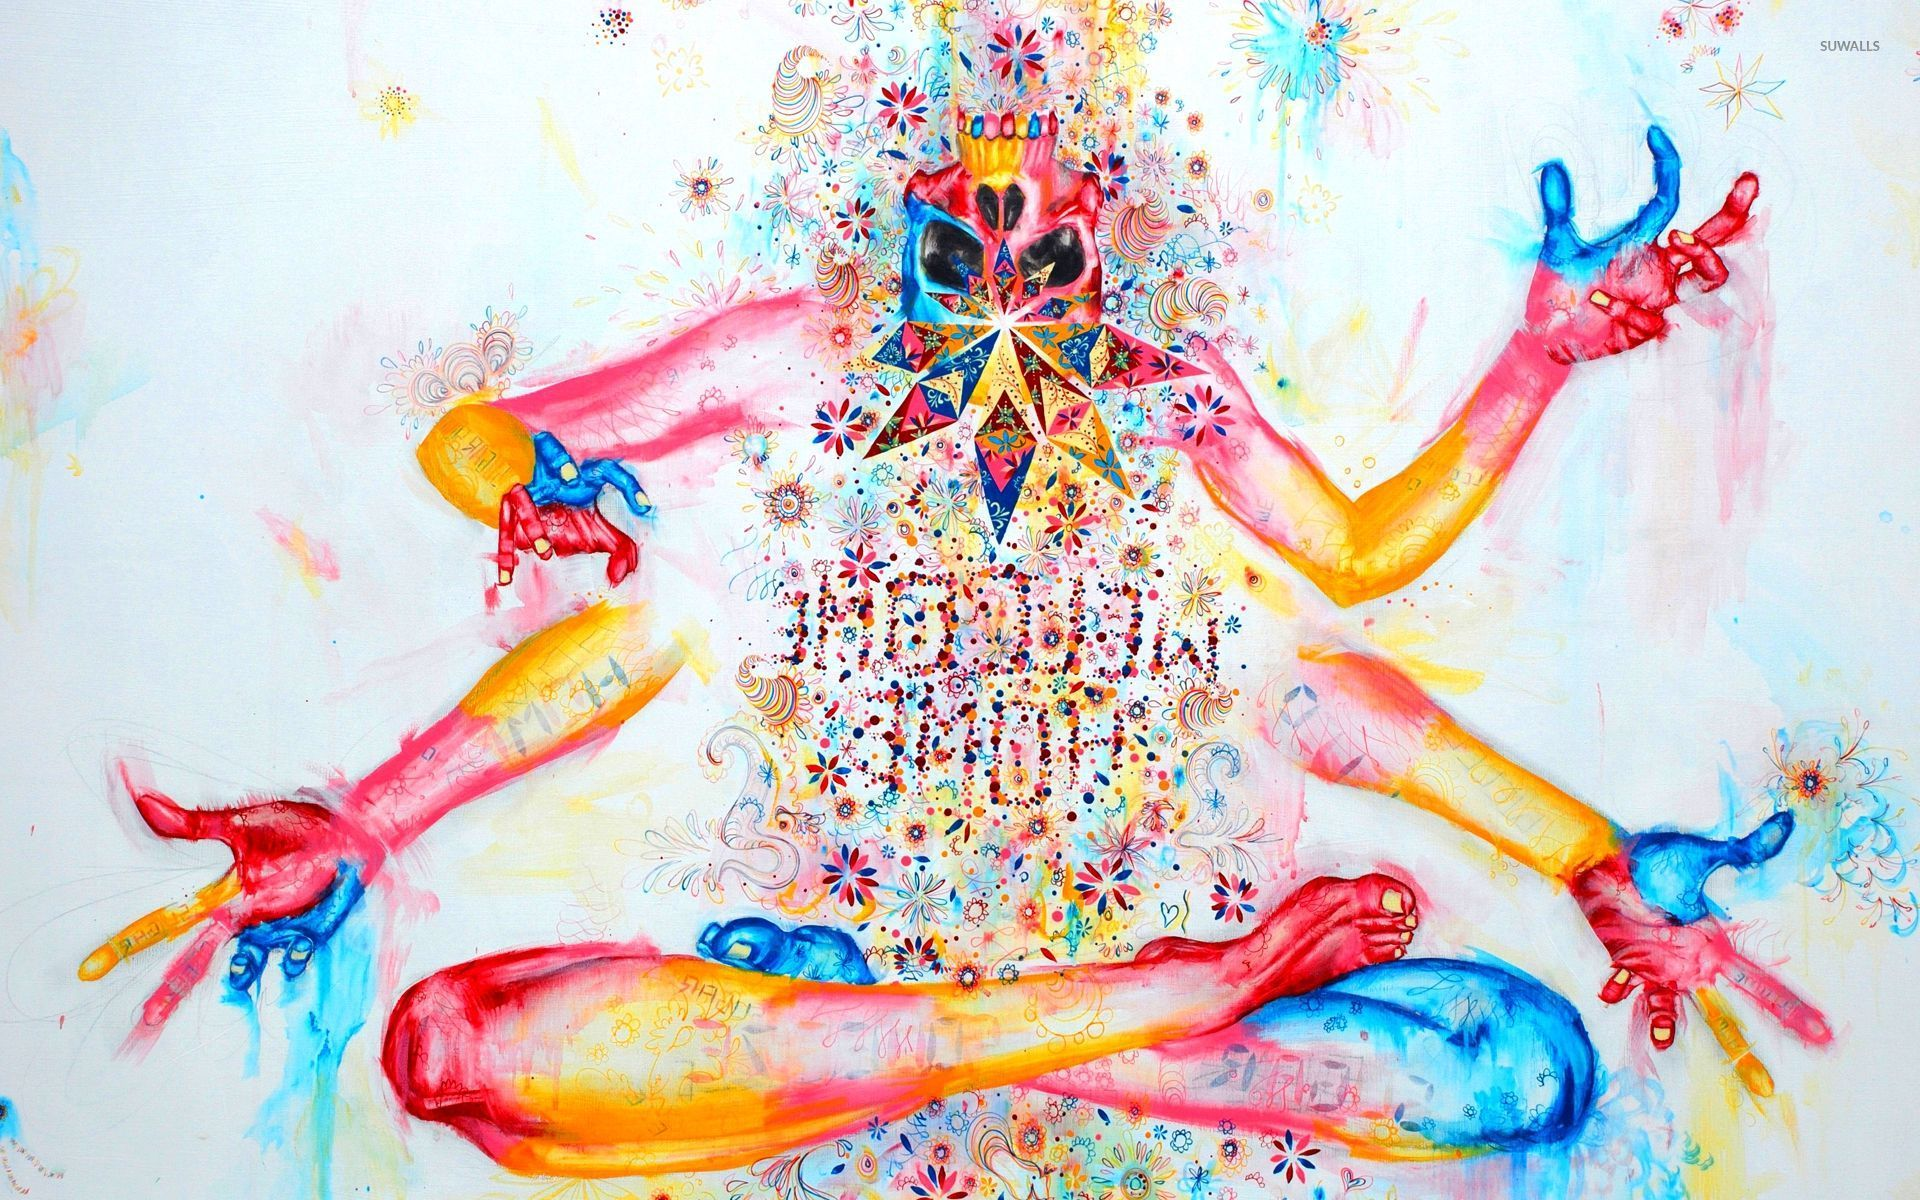 Colorful Meditation Wallpaper Digital Art Wallpapers 54278